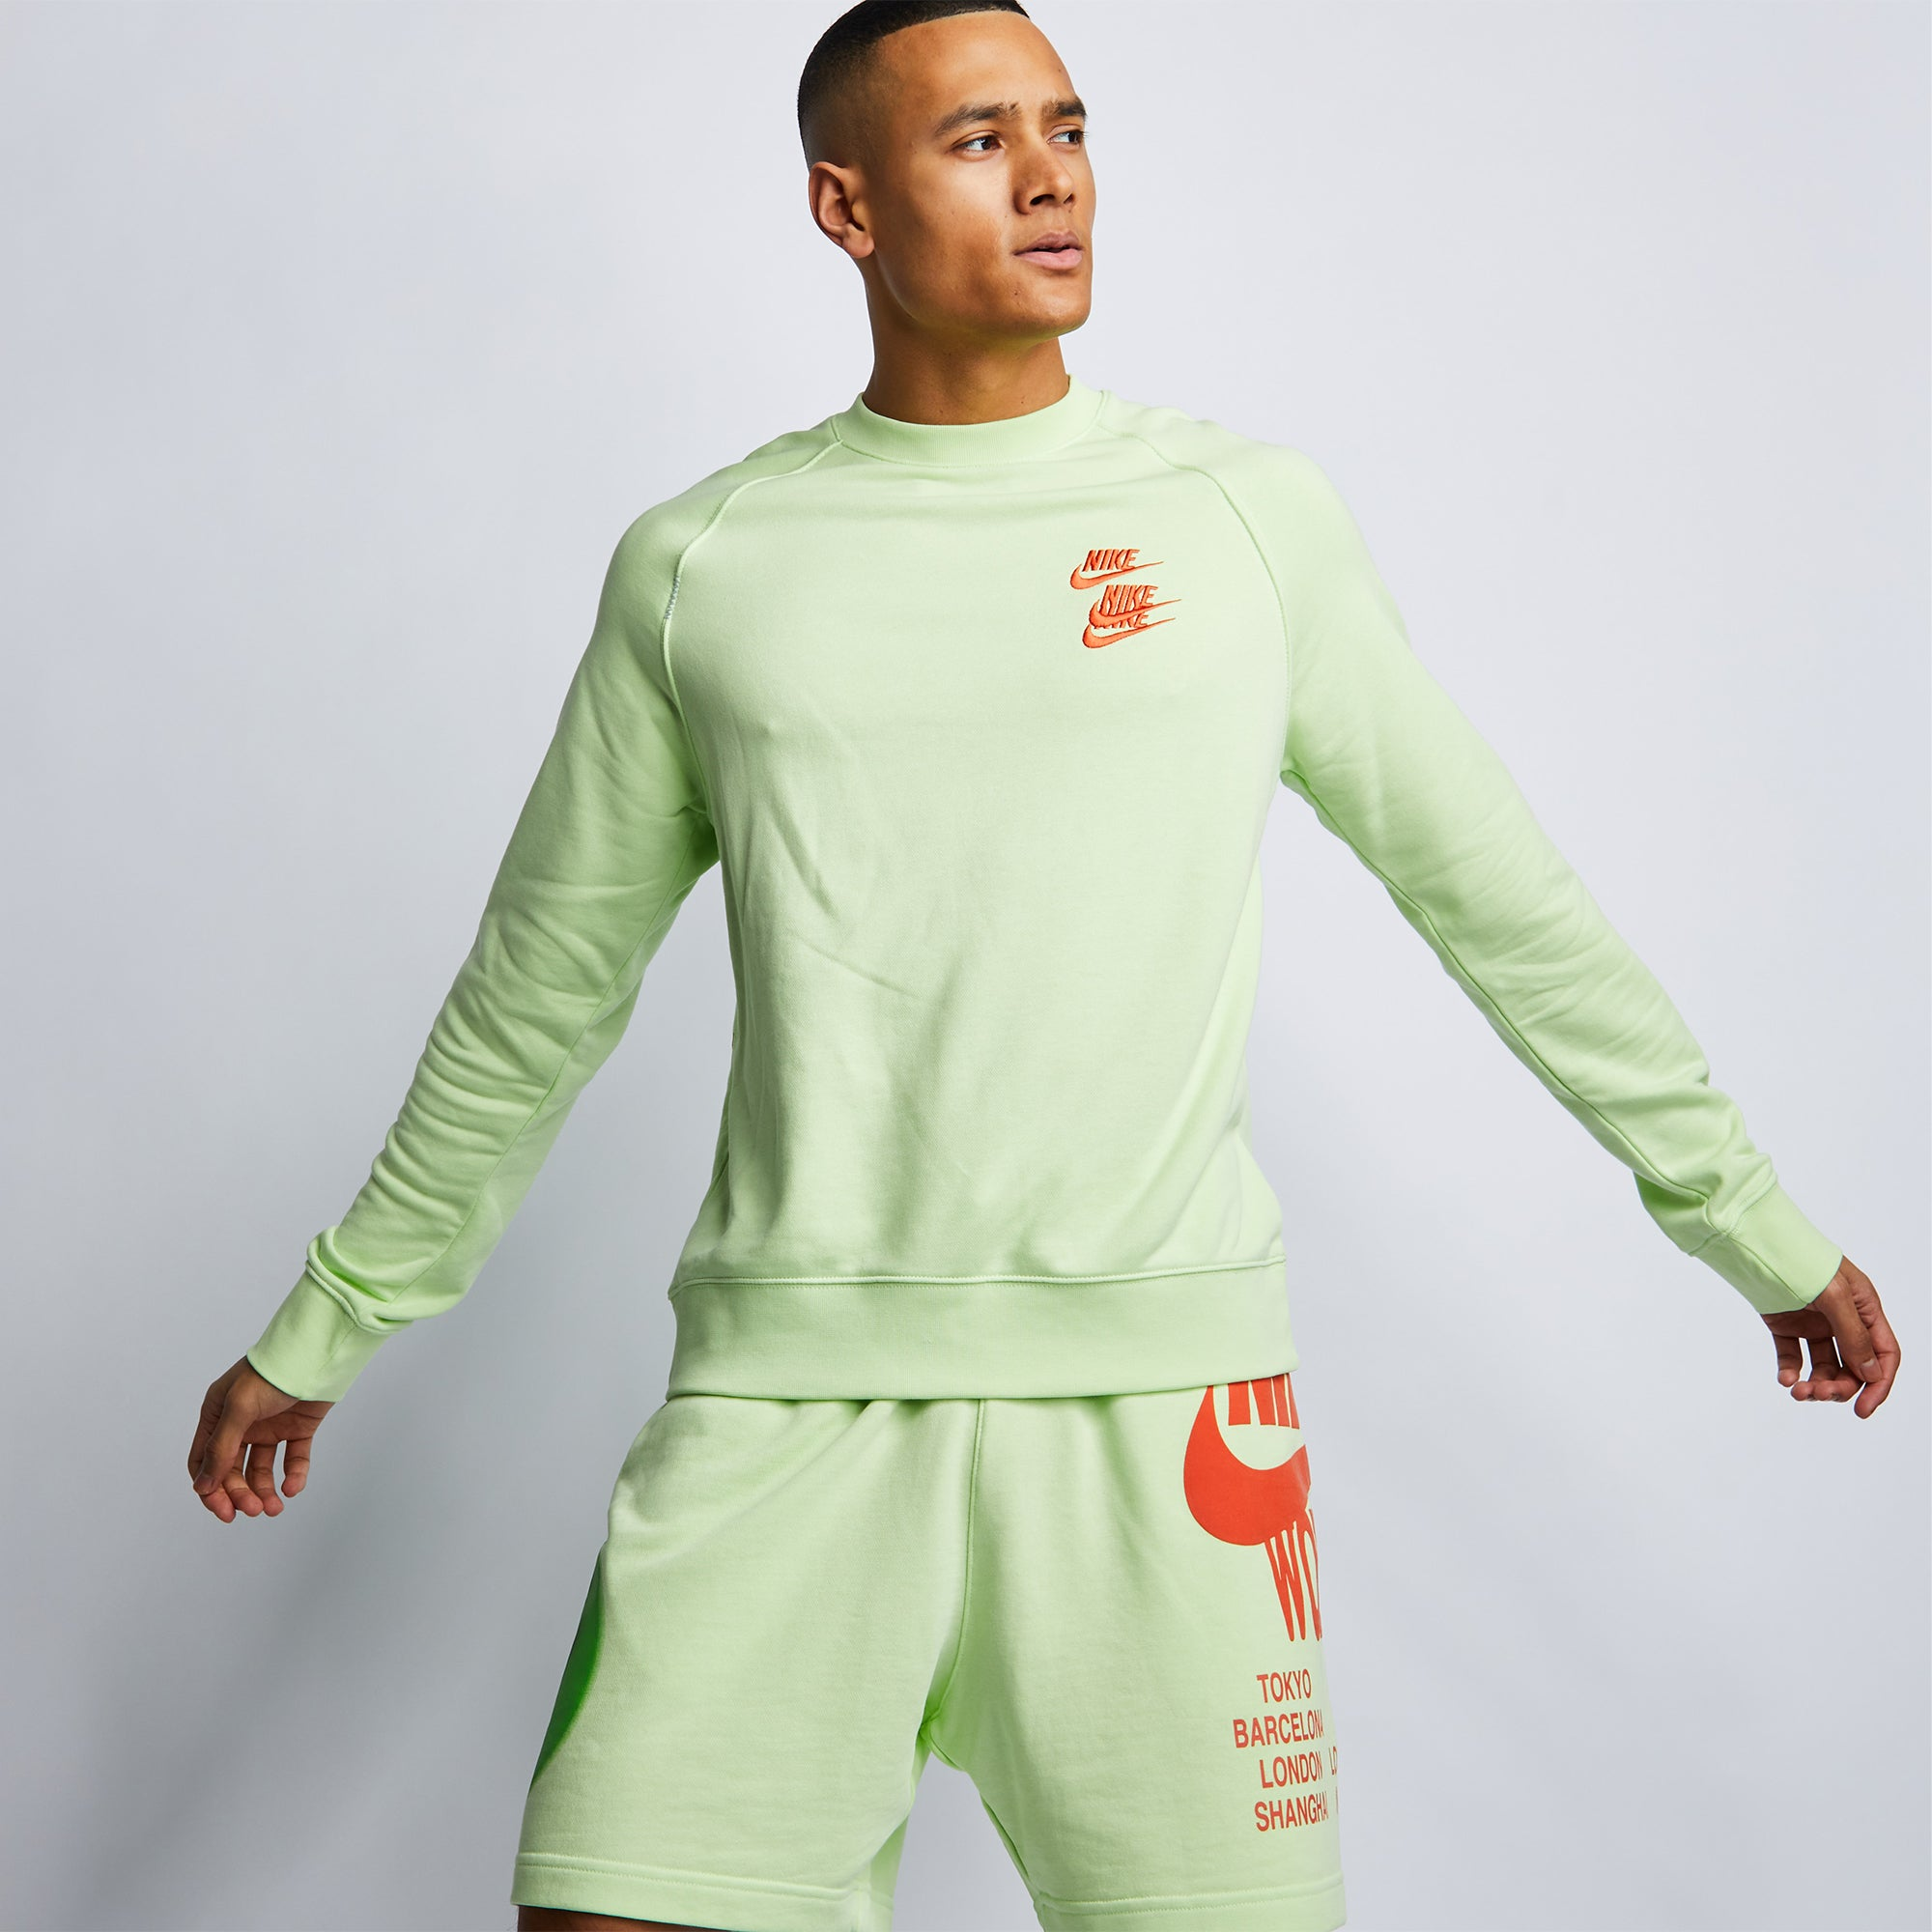 Nike World Tour Sweatshirt